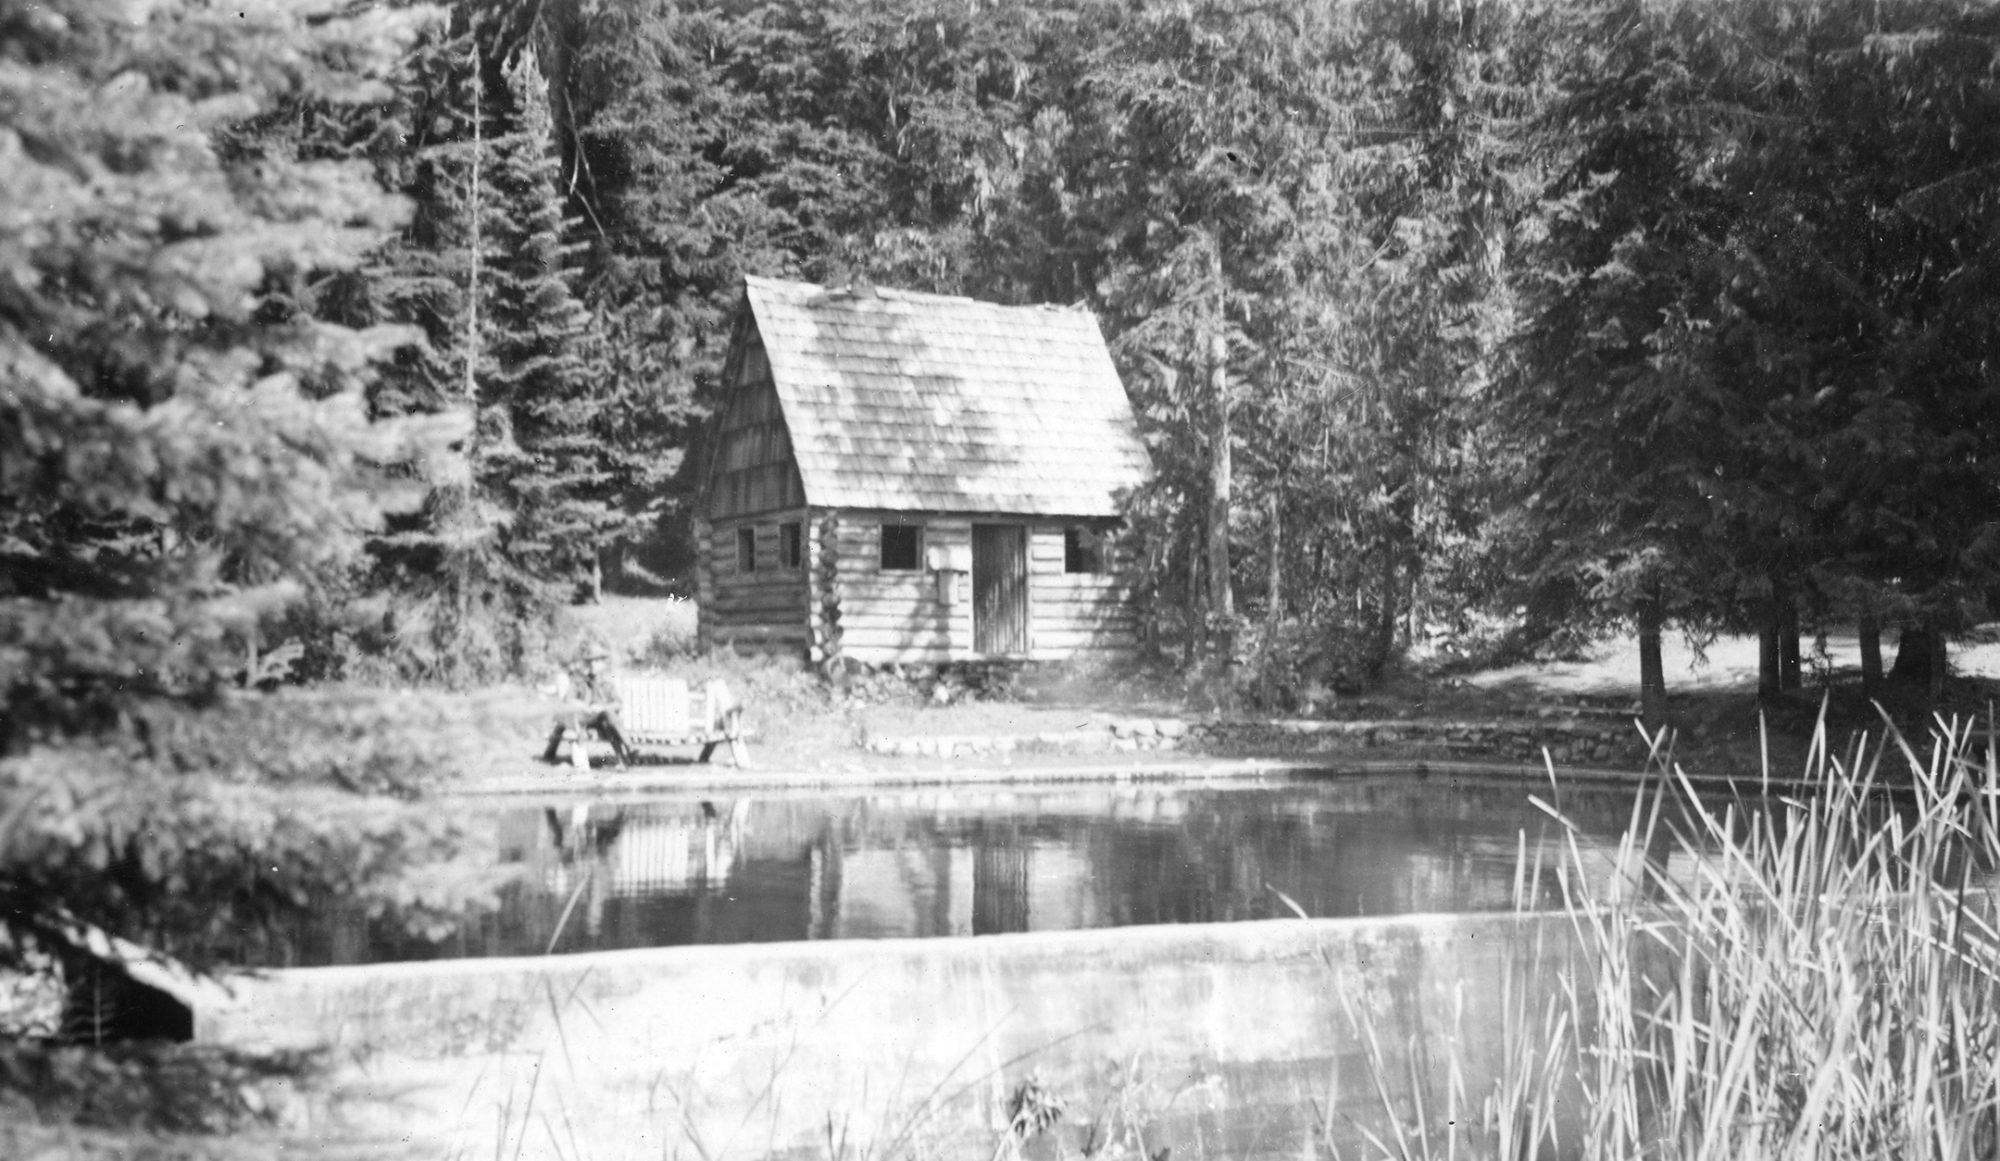 Mt. Hood History